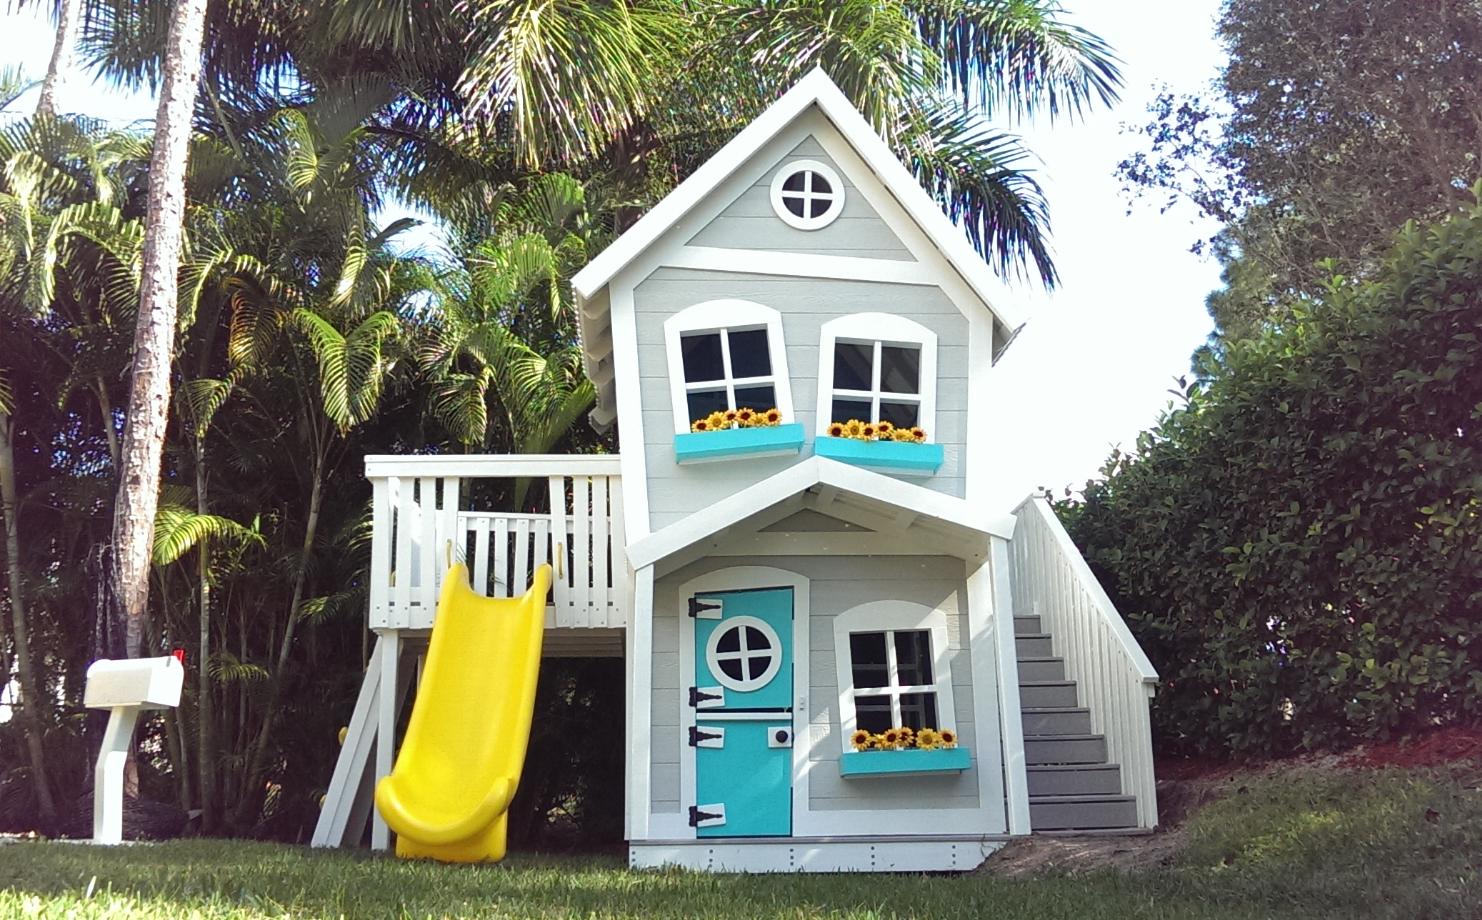 Imagine That Playhouses Play Houses Big Playhouses Backyard Playhouse